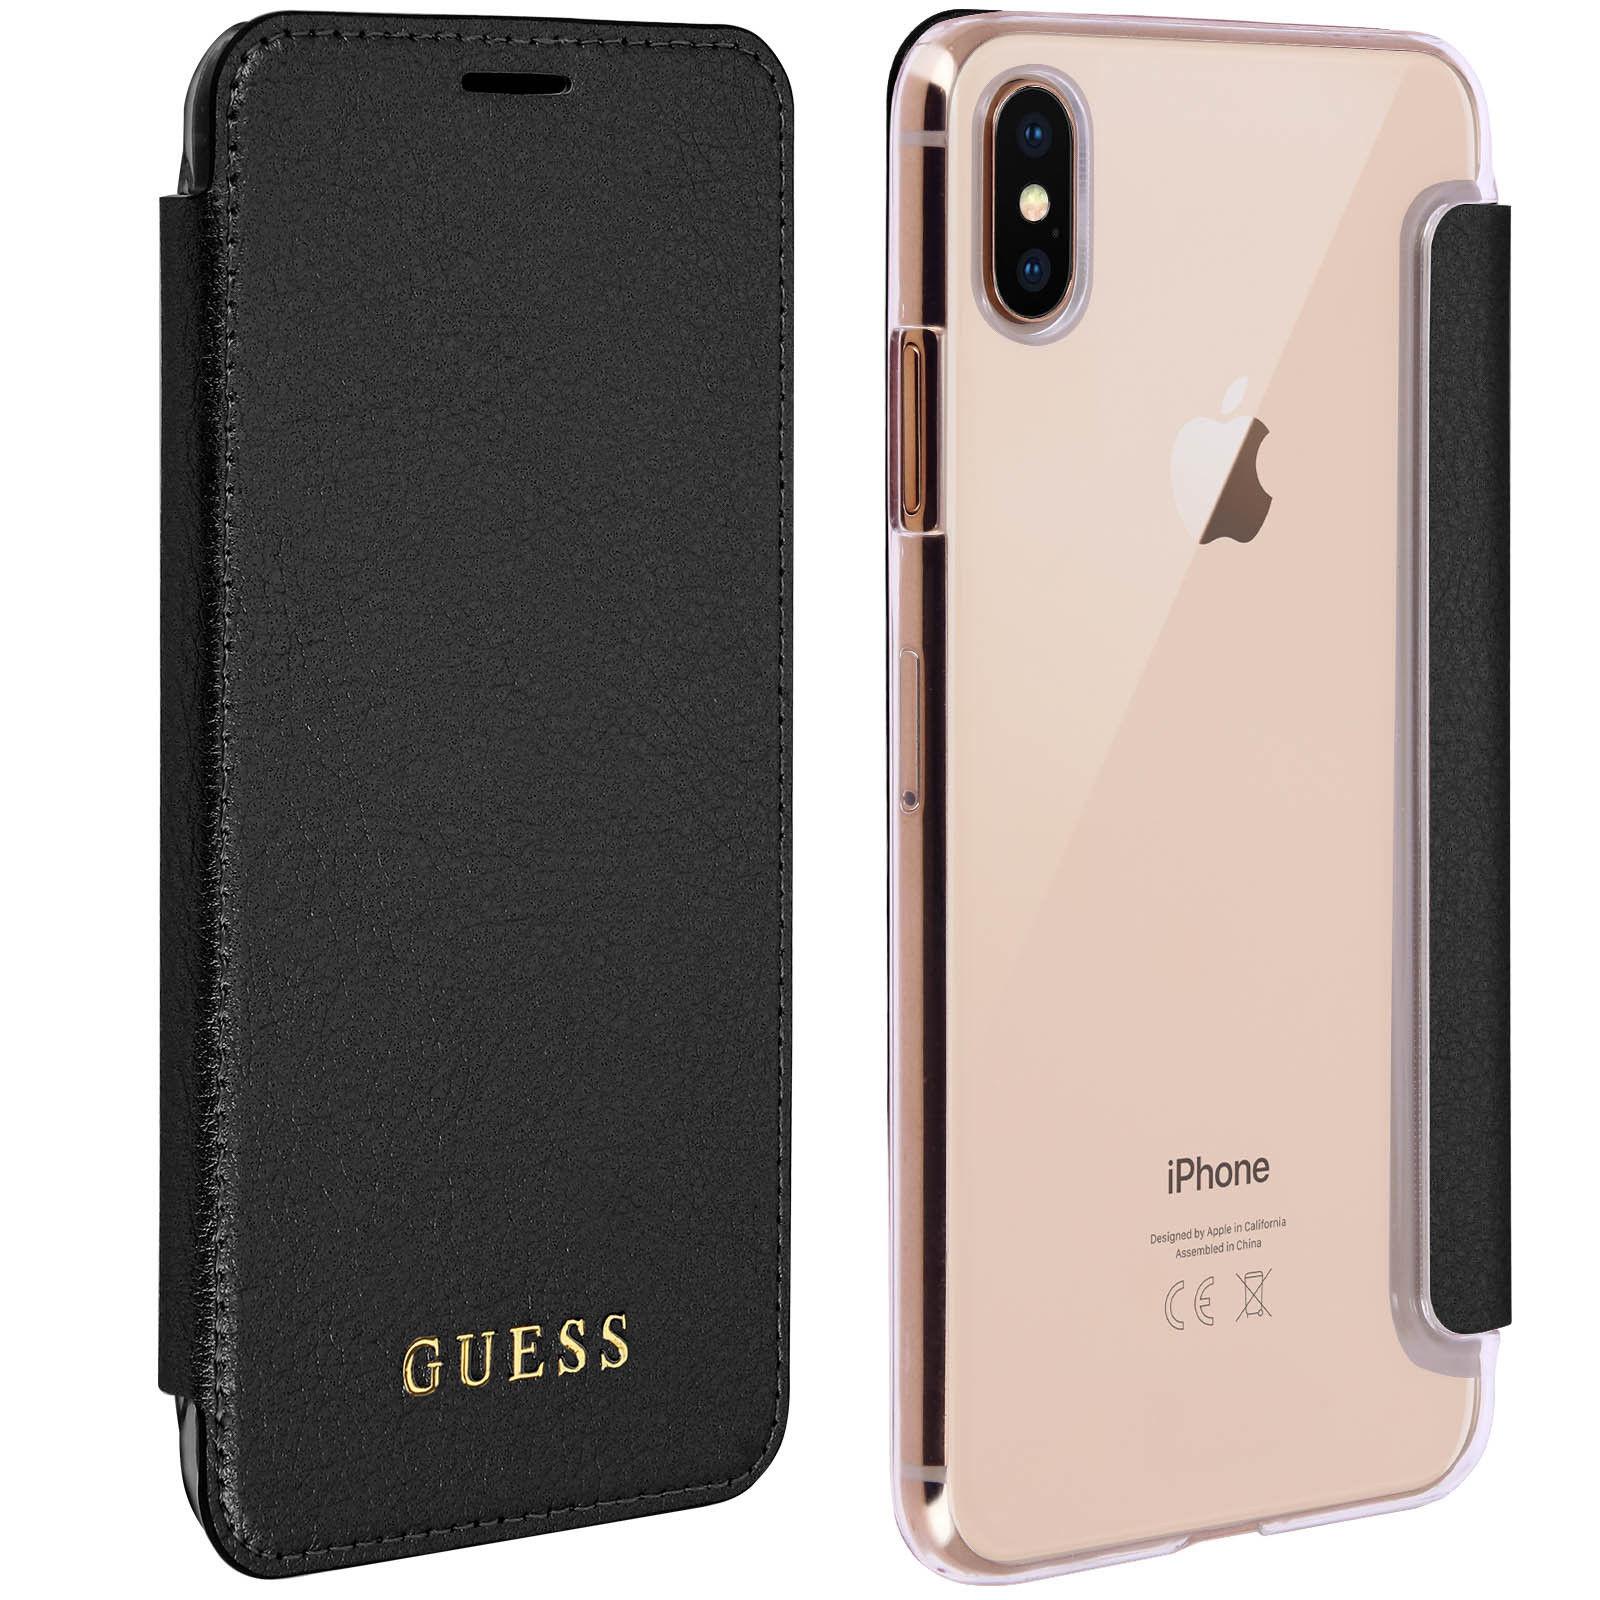 Pouzdro   kryt pro iPhone XS MAX - Guess a3dcc4d1b0e